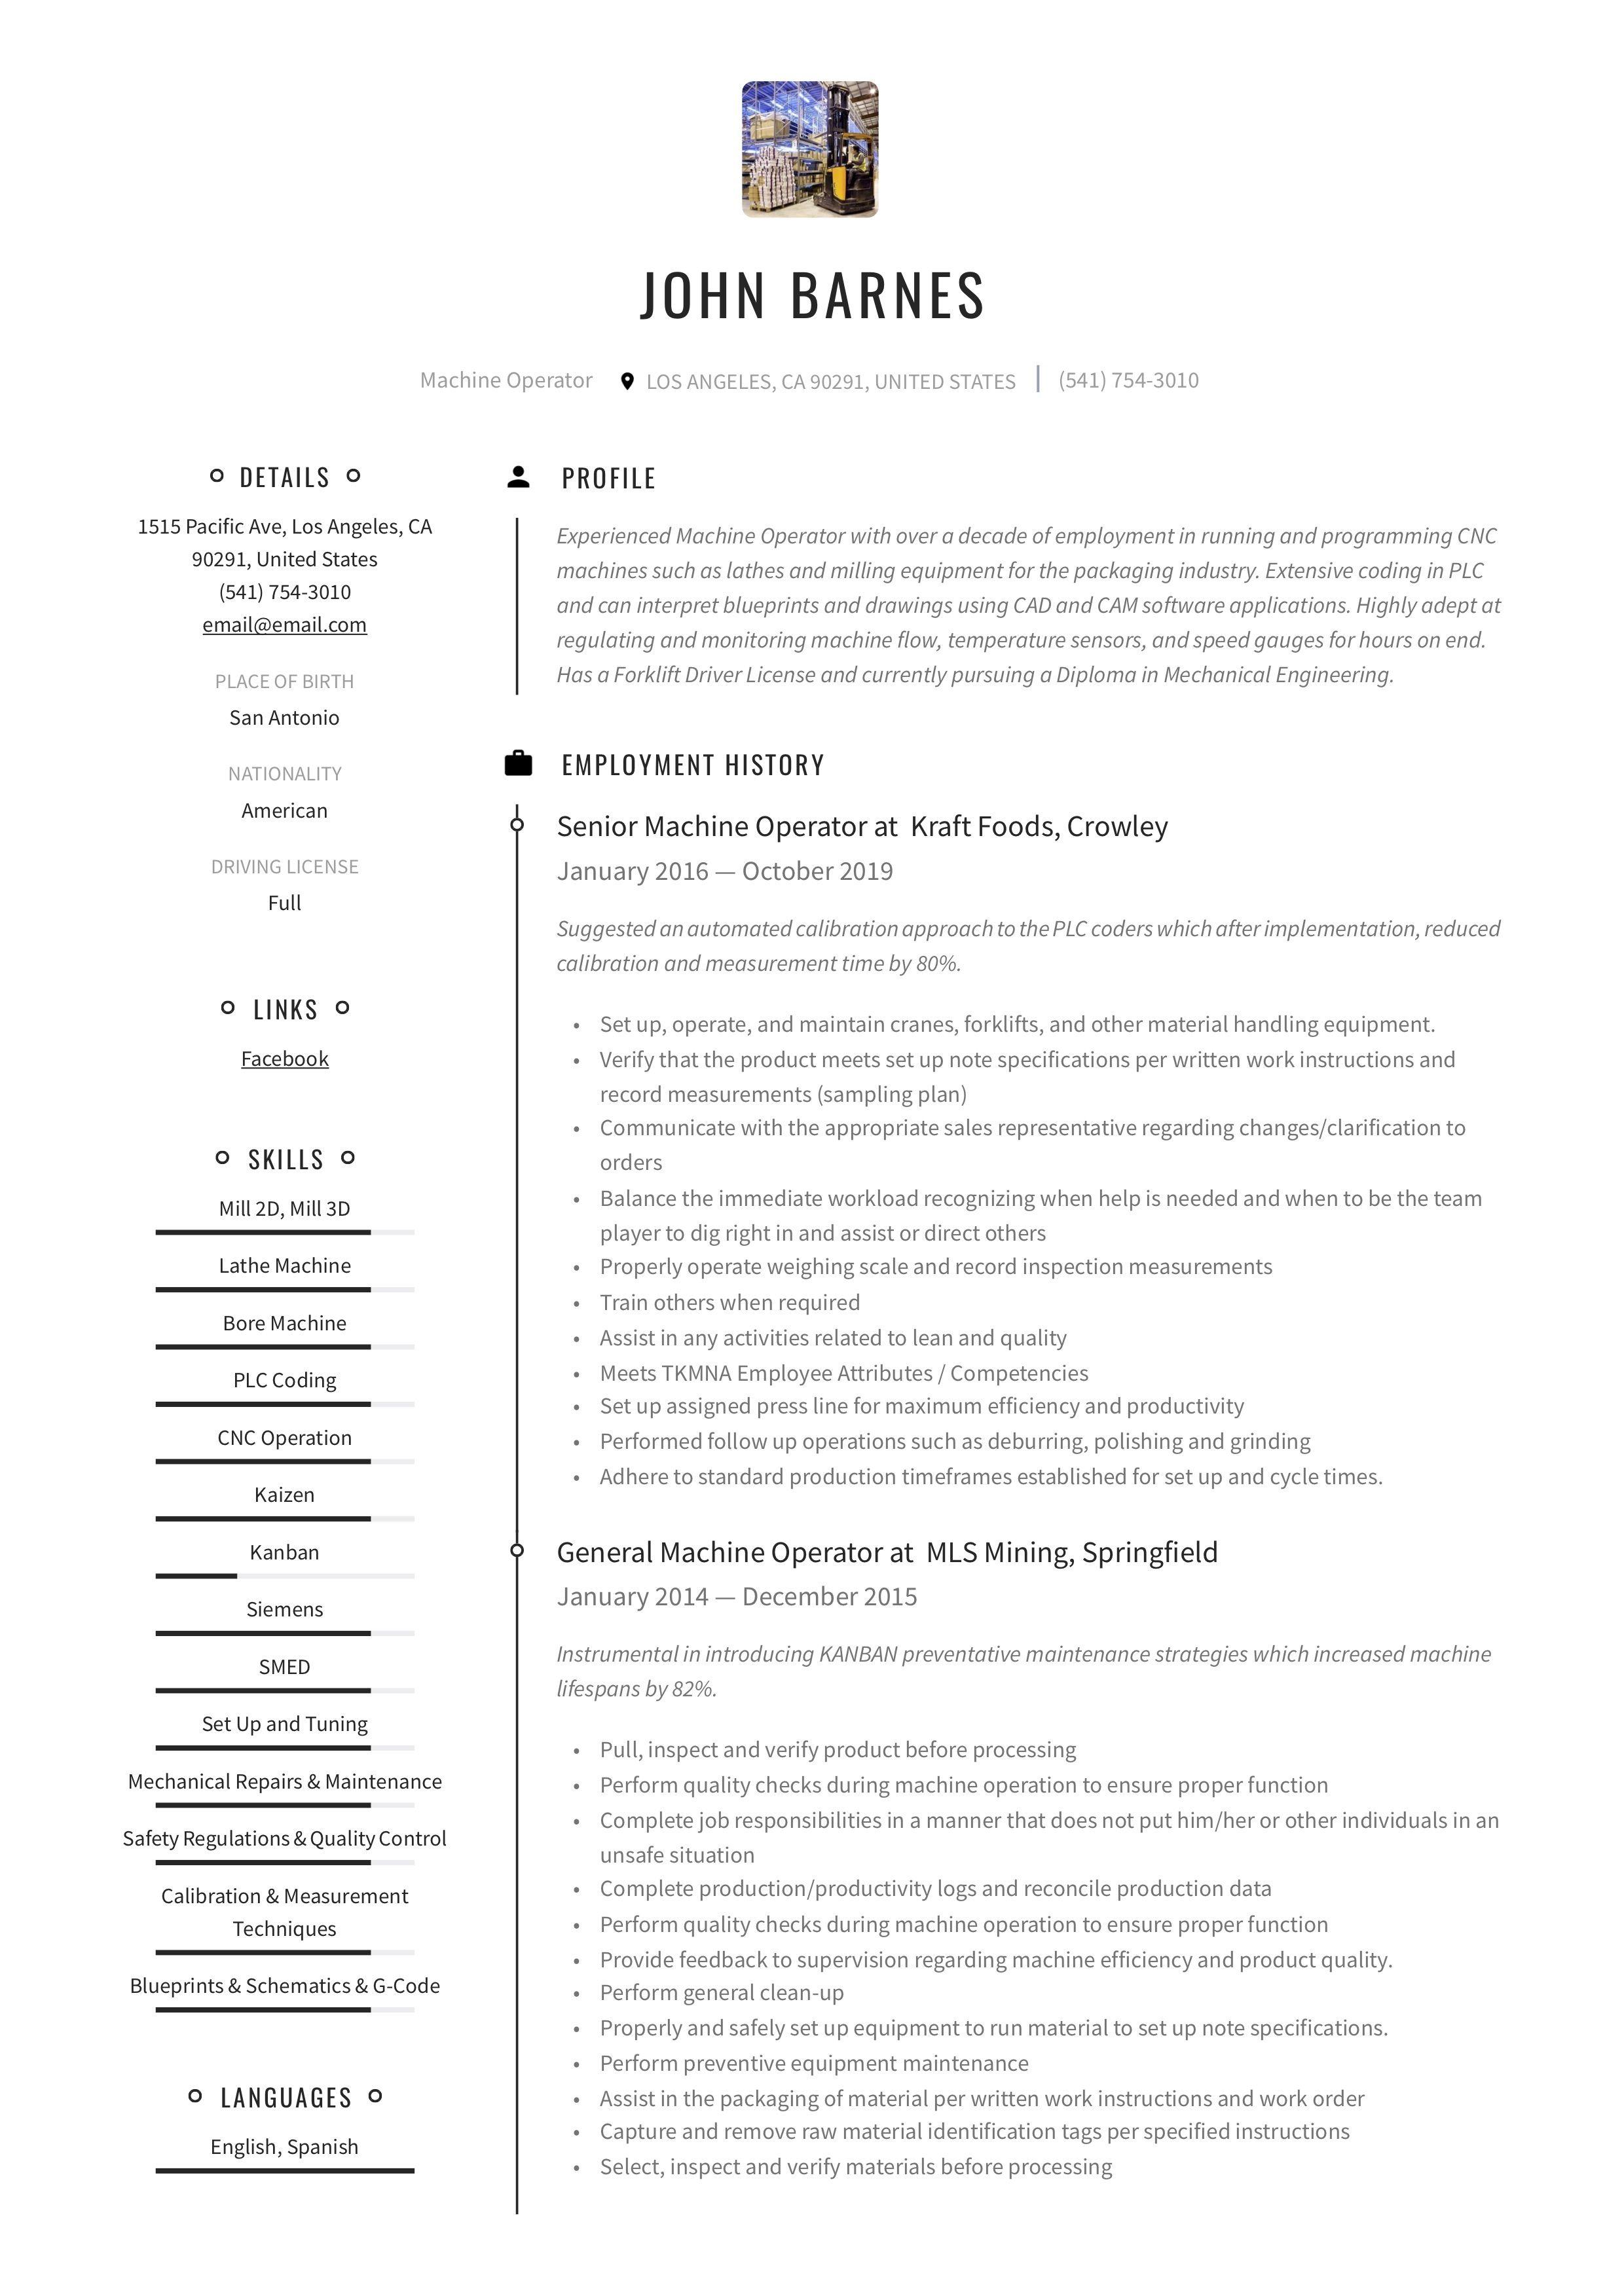 Machine operator resume writing guide in 2020 teacher